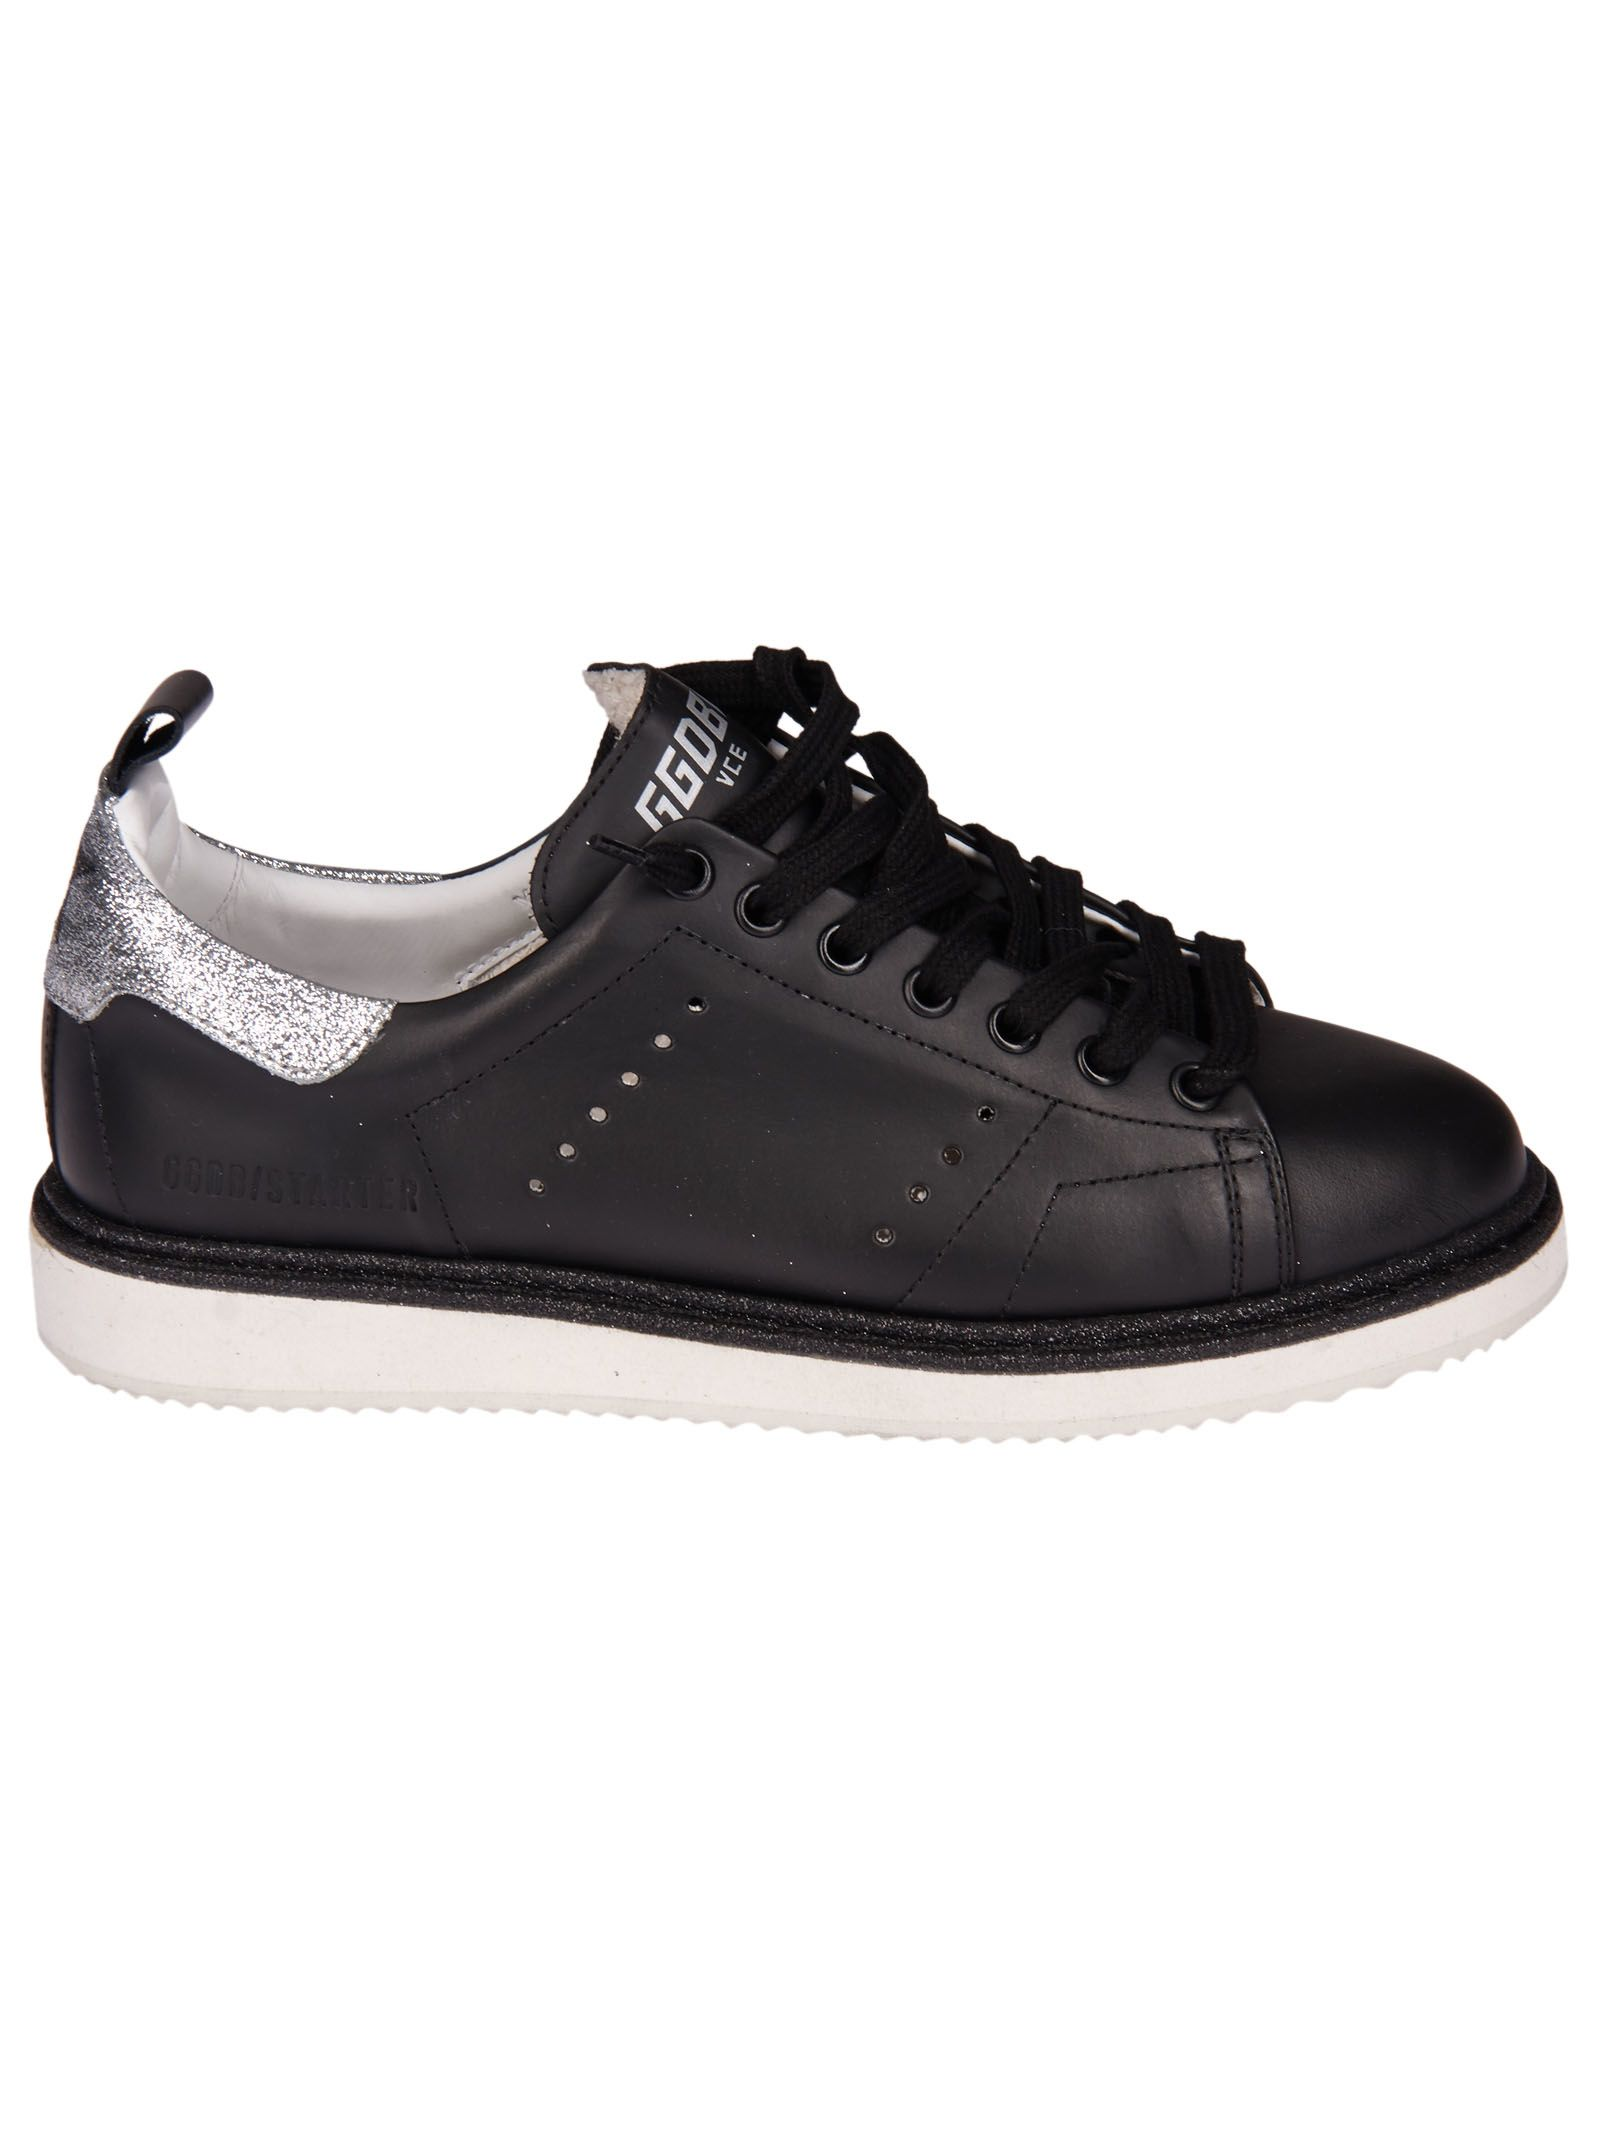 Starter Sneakers, Black